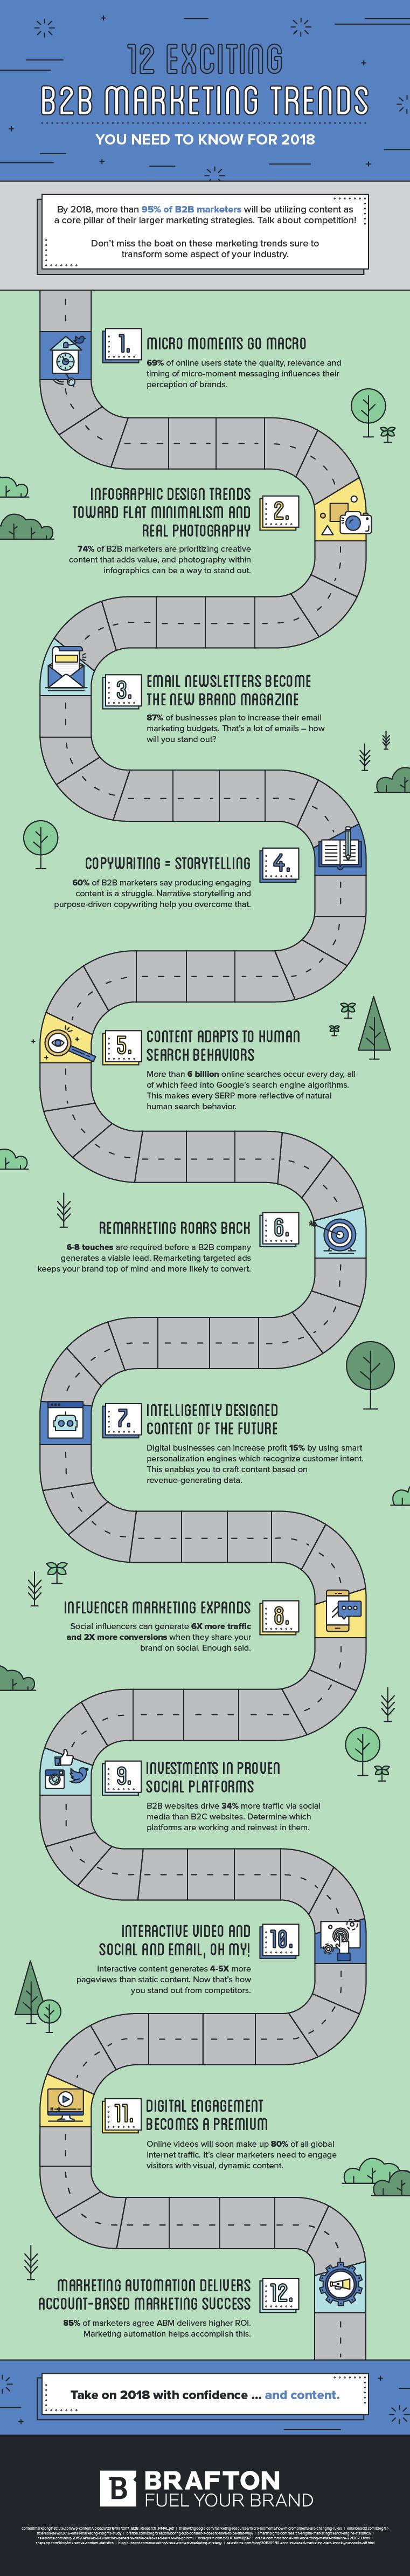 12 B2B Marketing Trends PG.jpg